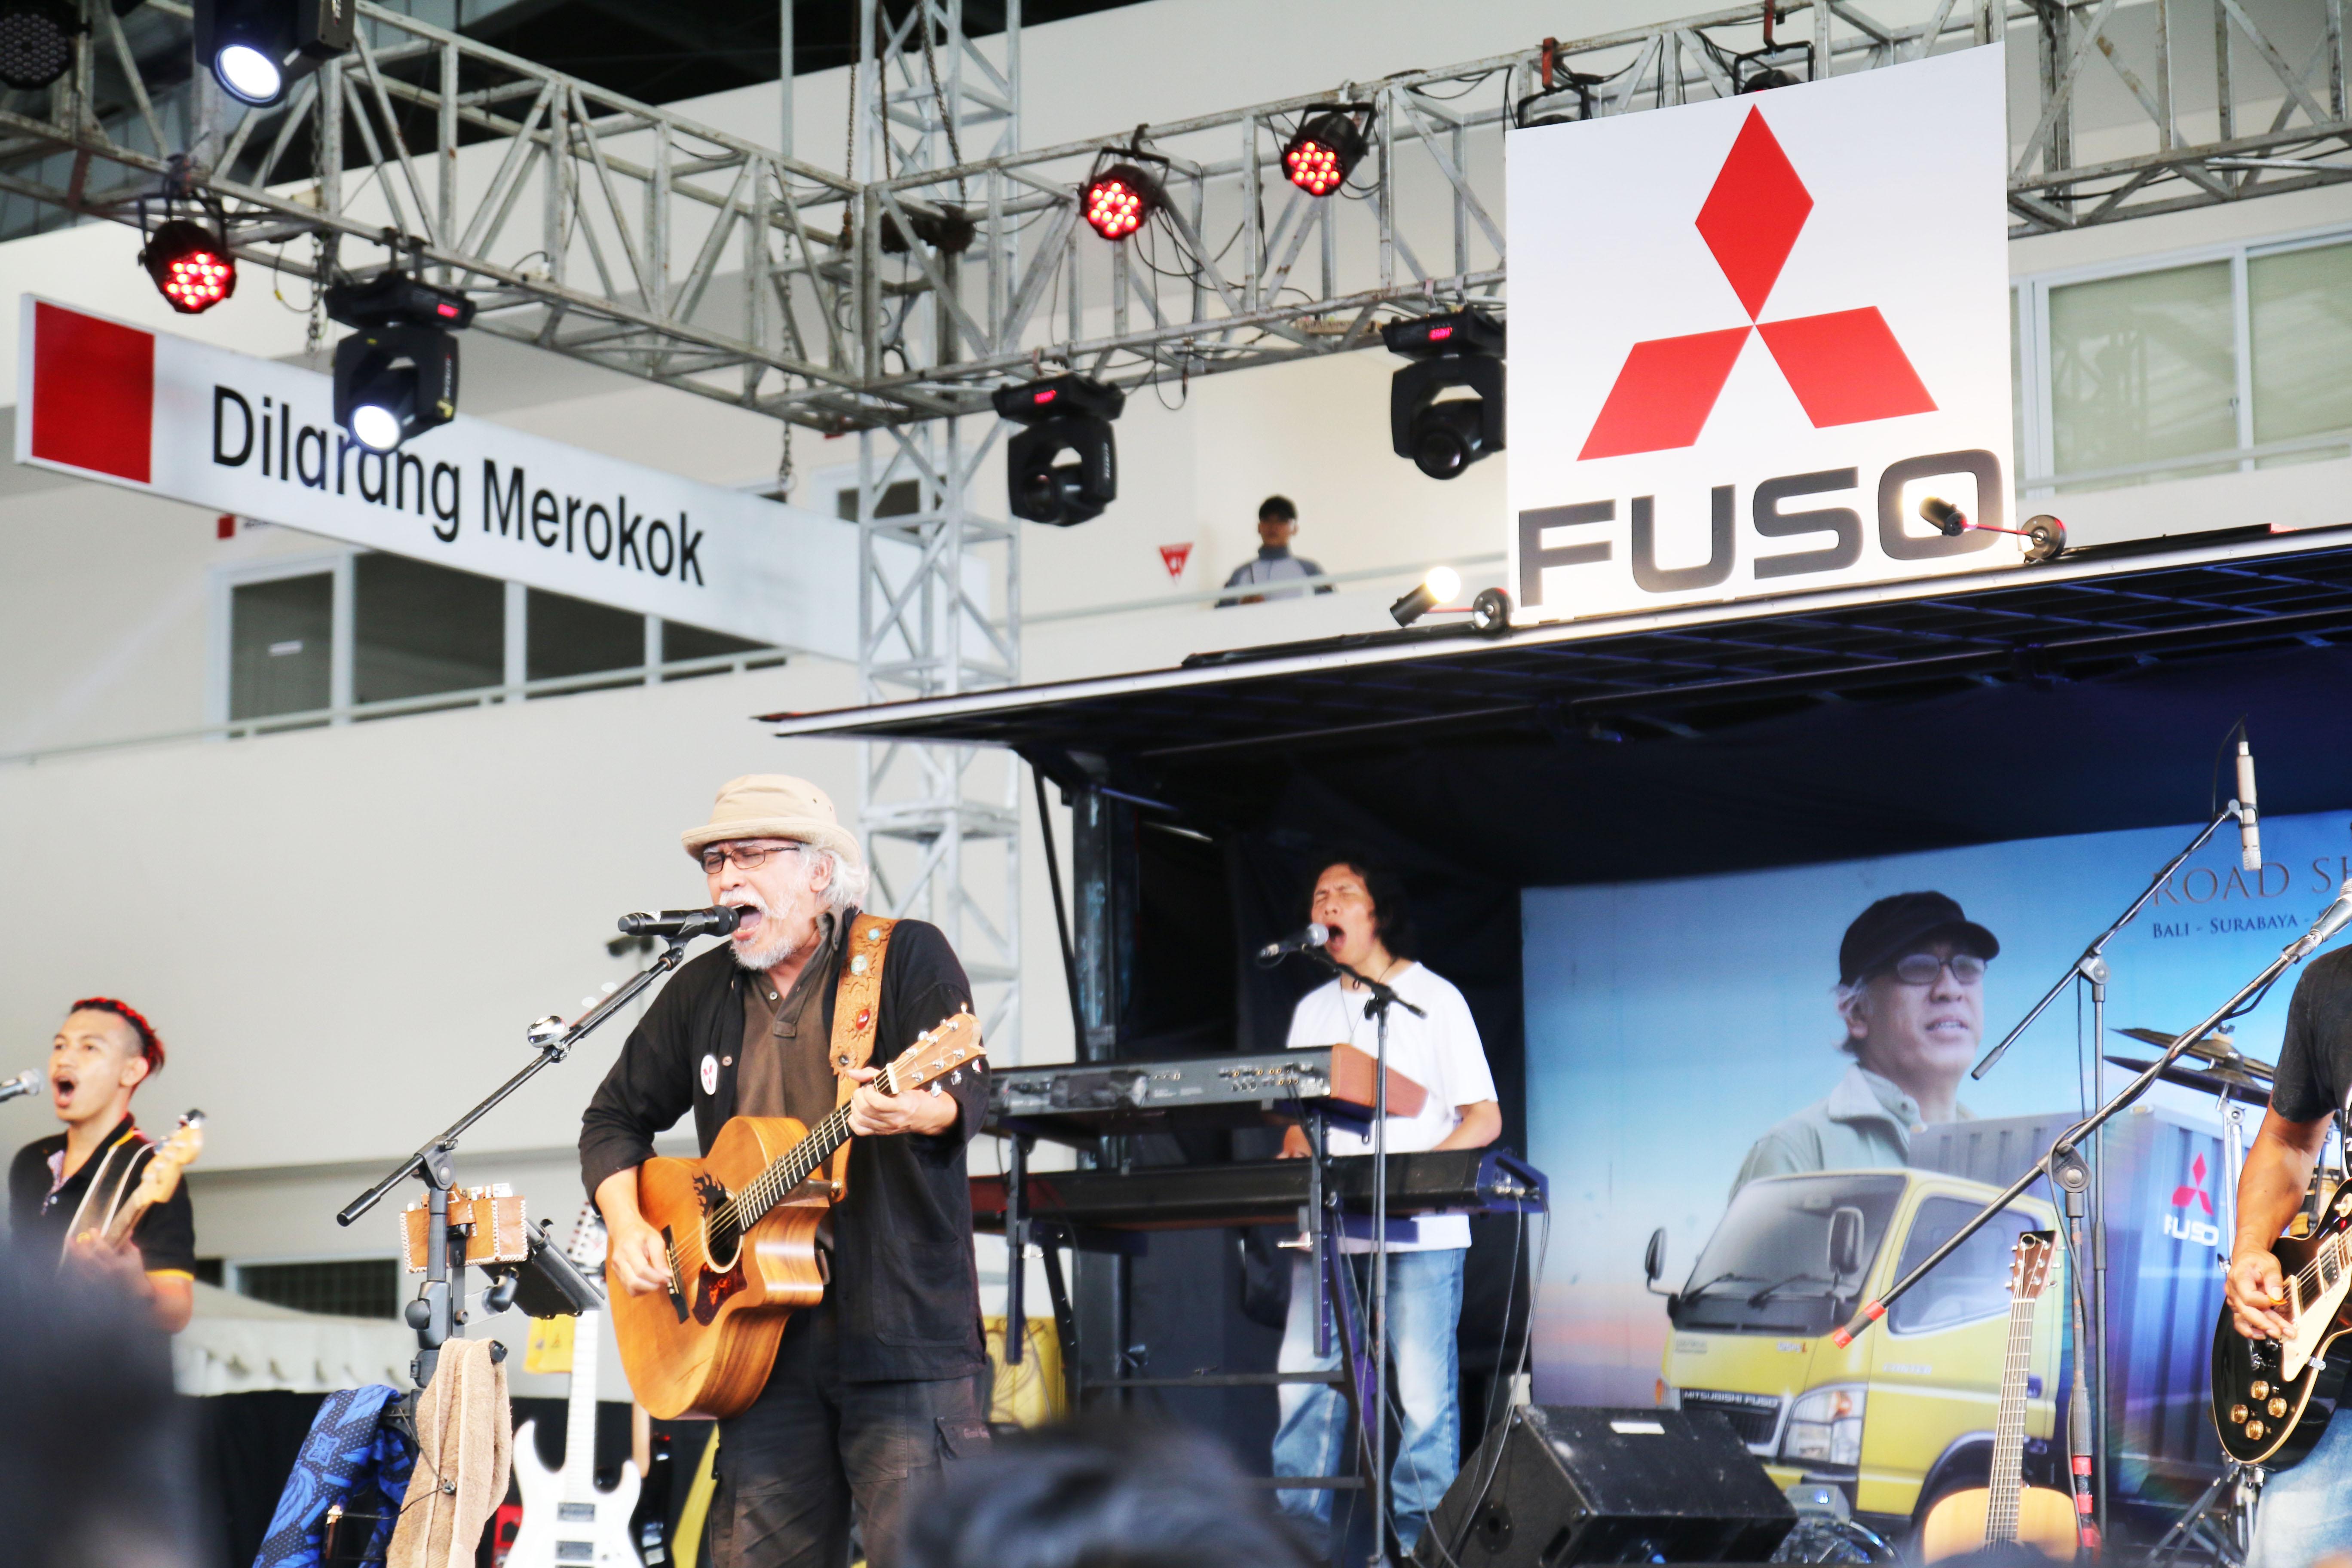 LAMPUNG POST | Mitsubishi Fuso-Iwan Fals Gelar Roadshow di Serang